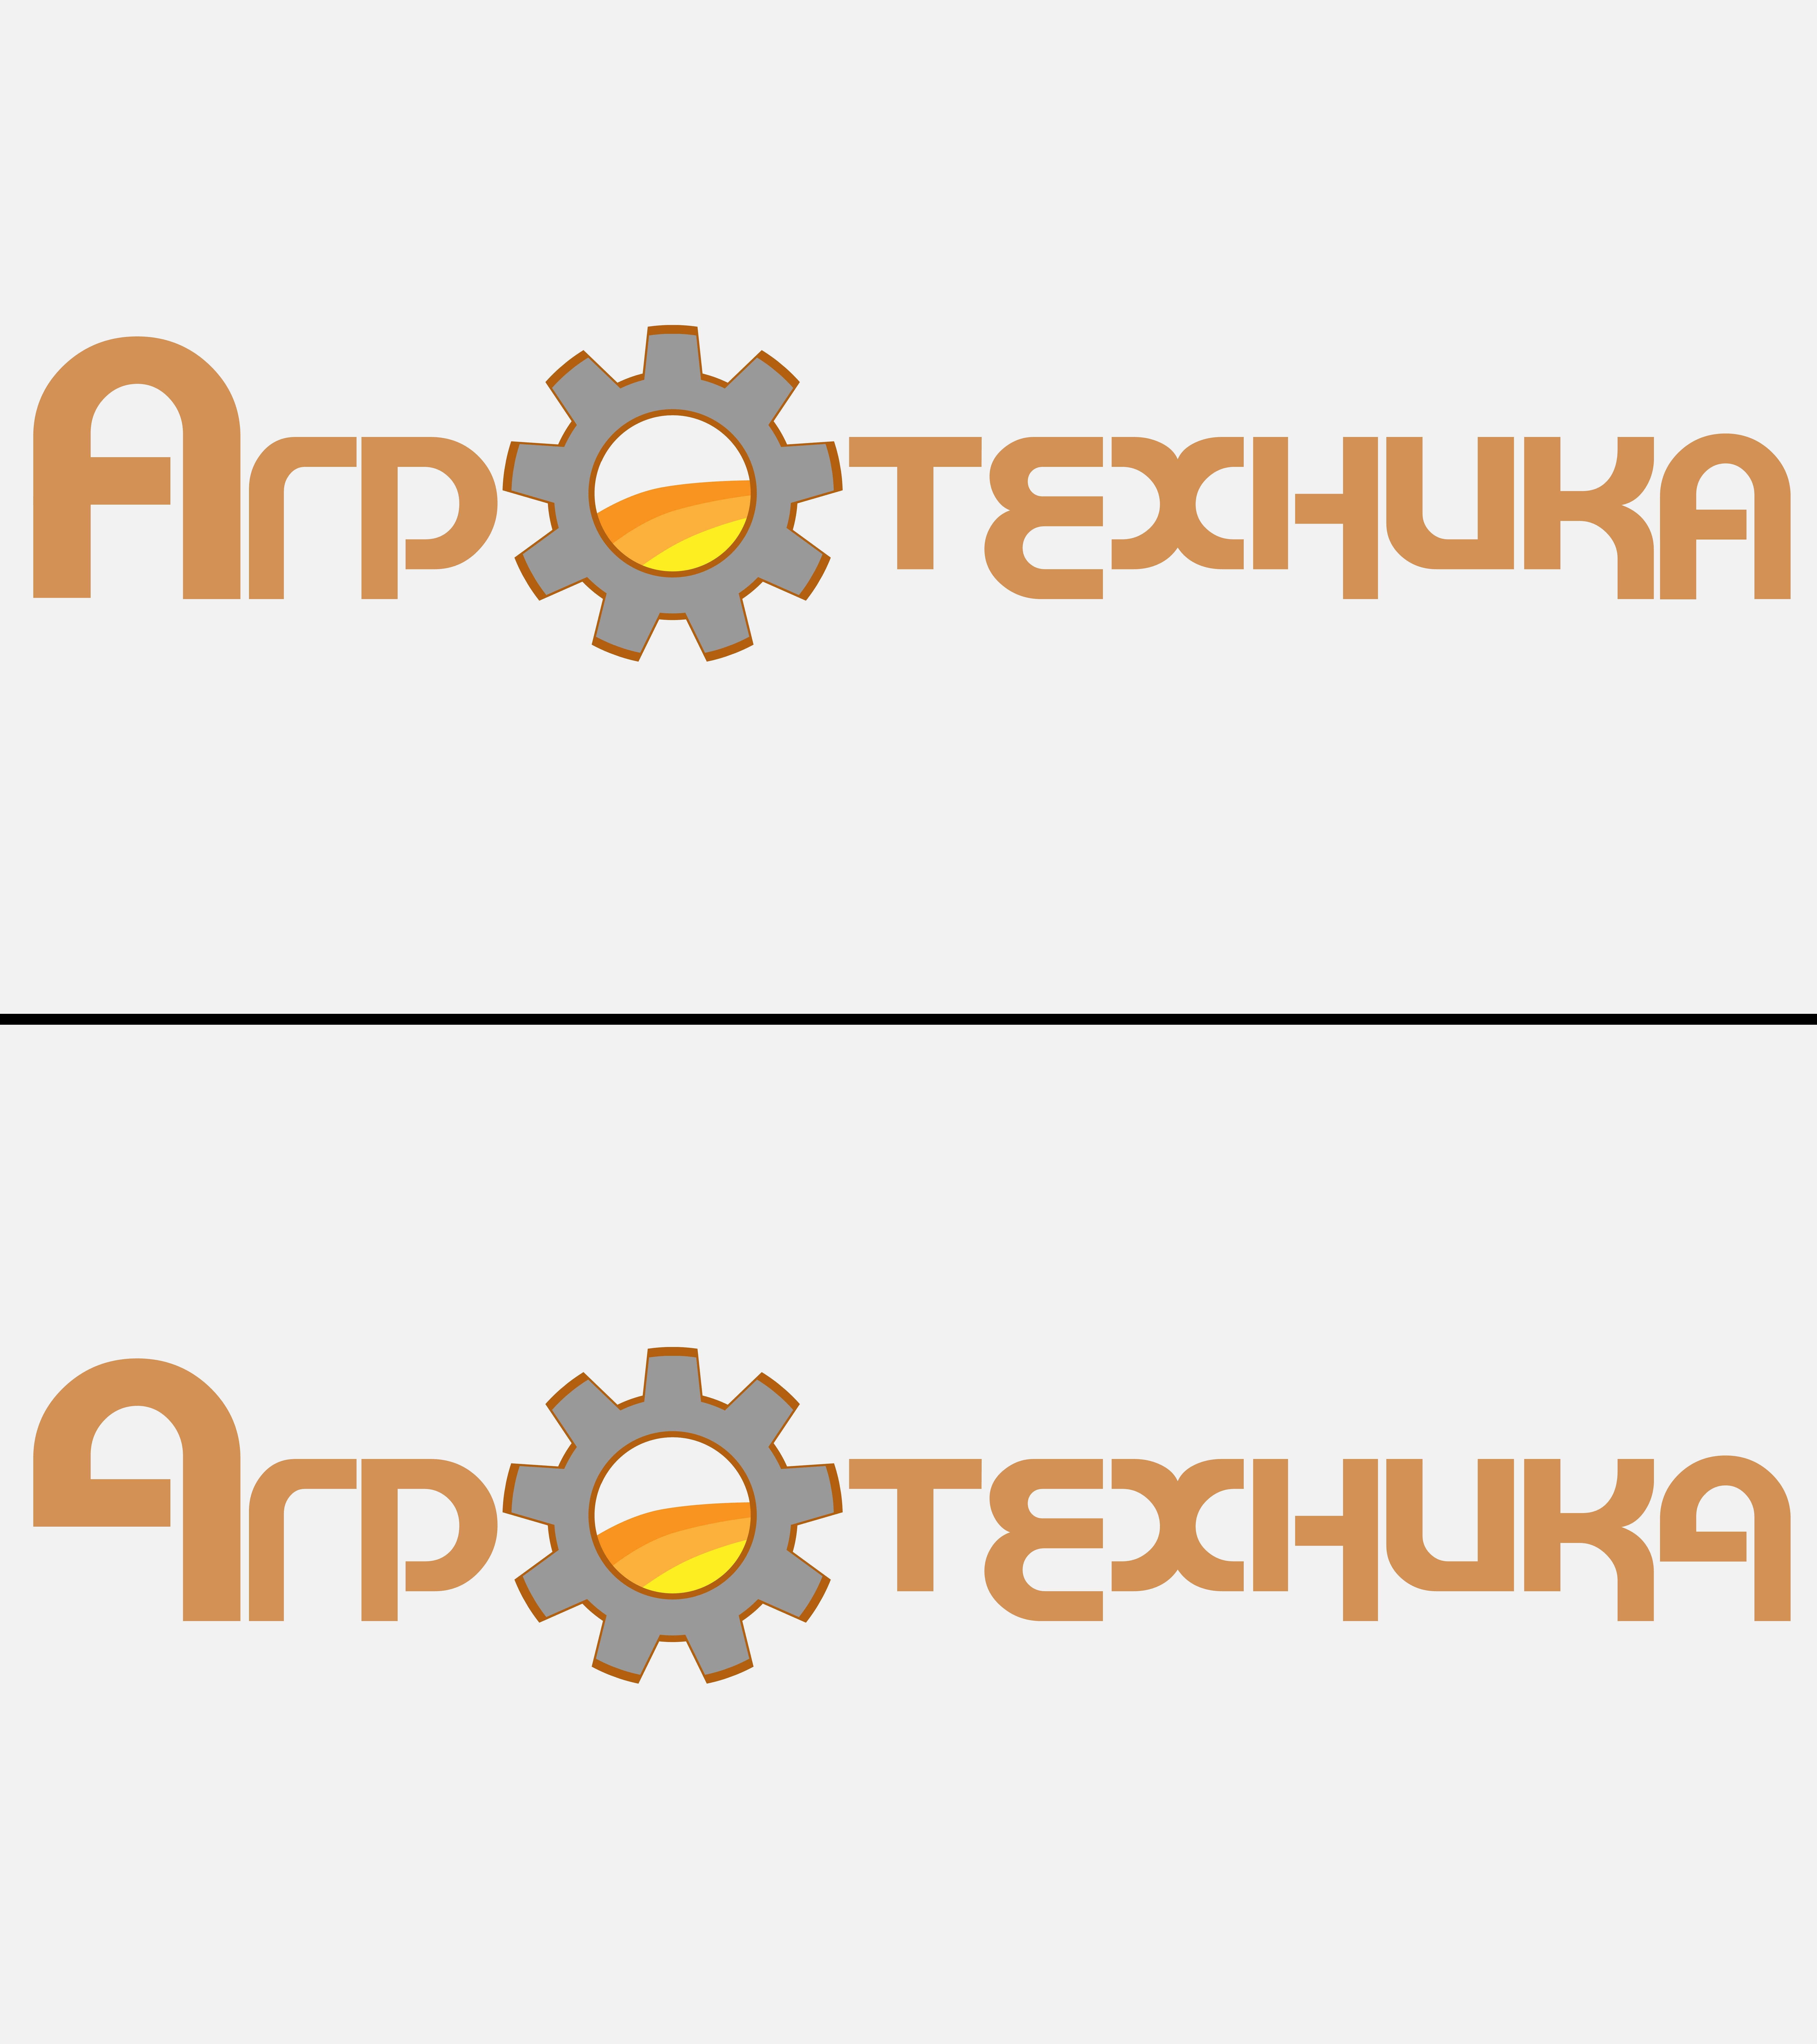 Разработка логотипа для компании Агротехника фото f_7885c02e1de39772.jpg